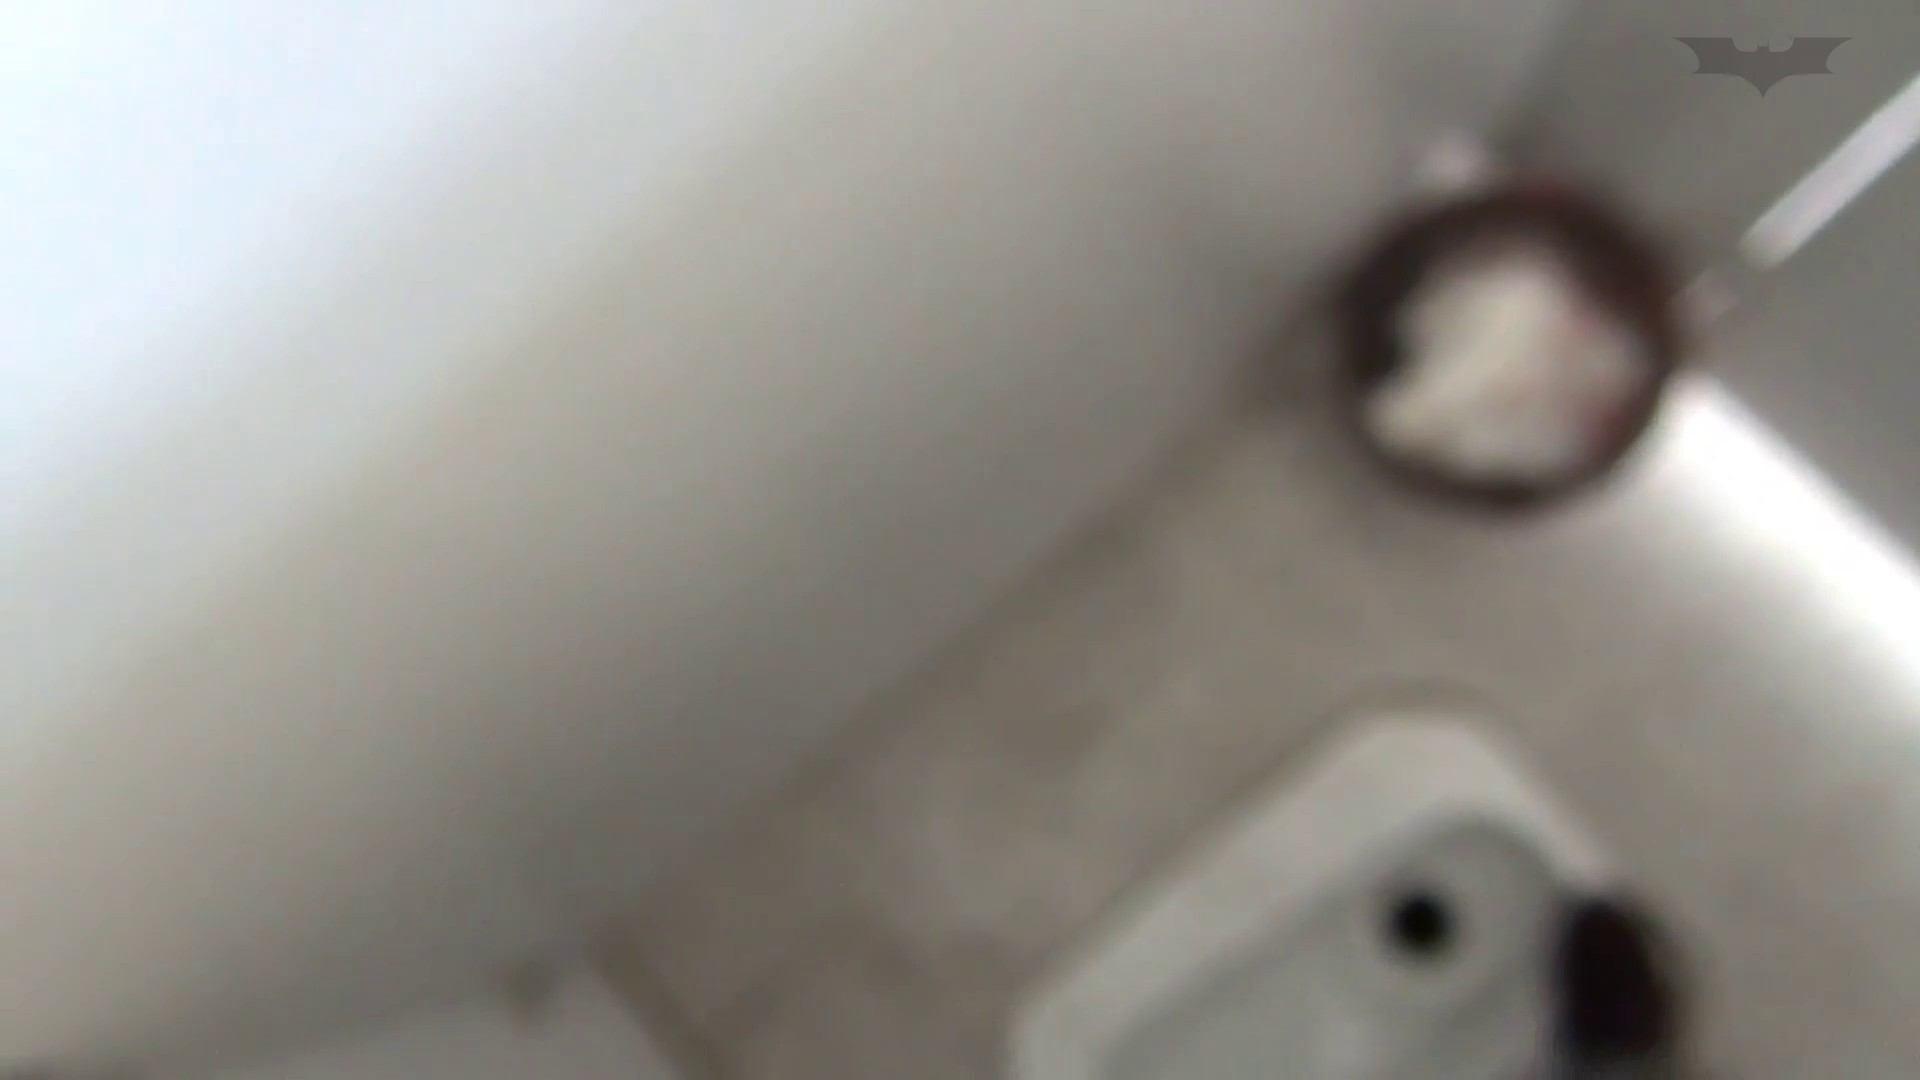 JD盗撮 美女の洗面所の秘密 Vol.55 丸見え AV無料動画キャプチャ 91画像 33